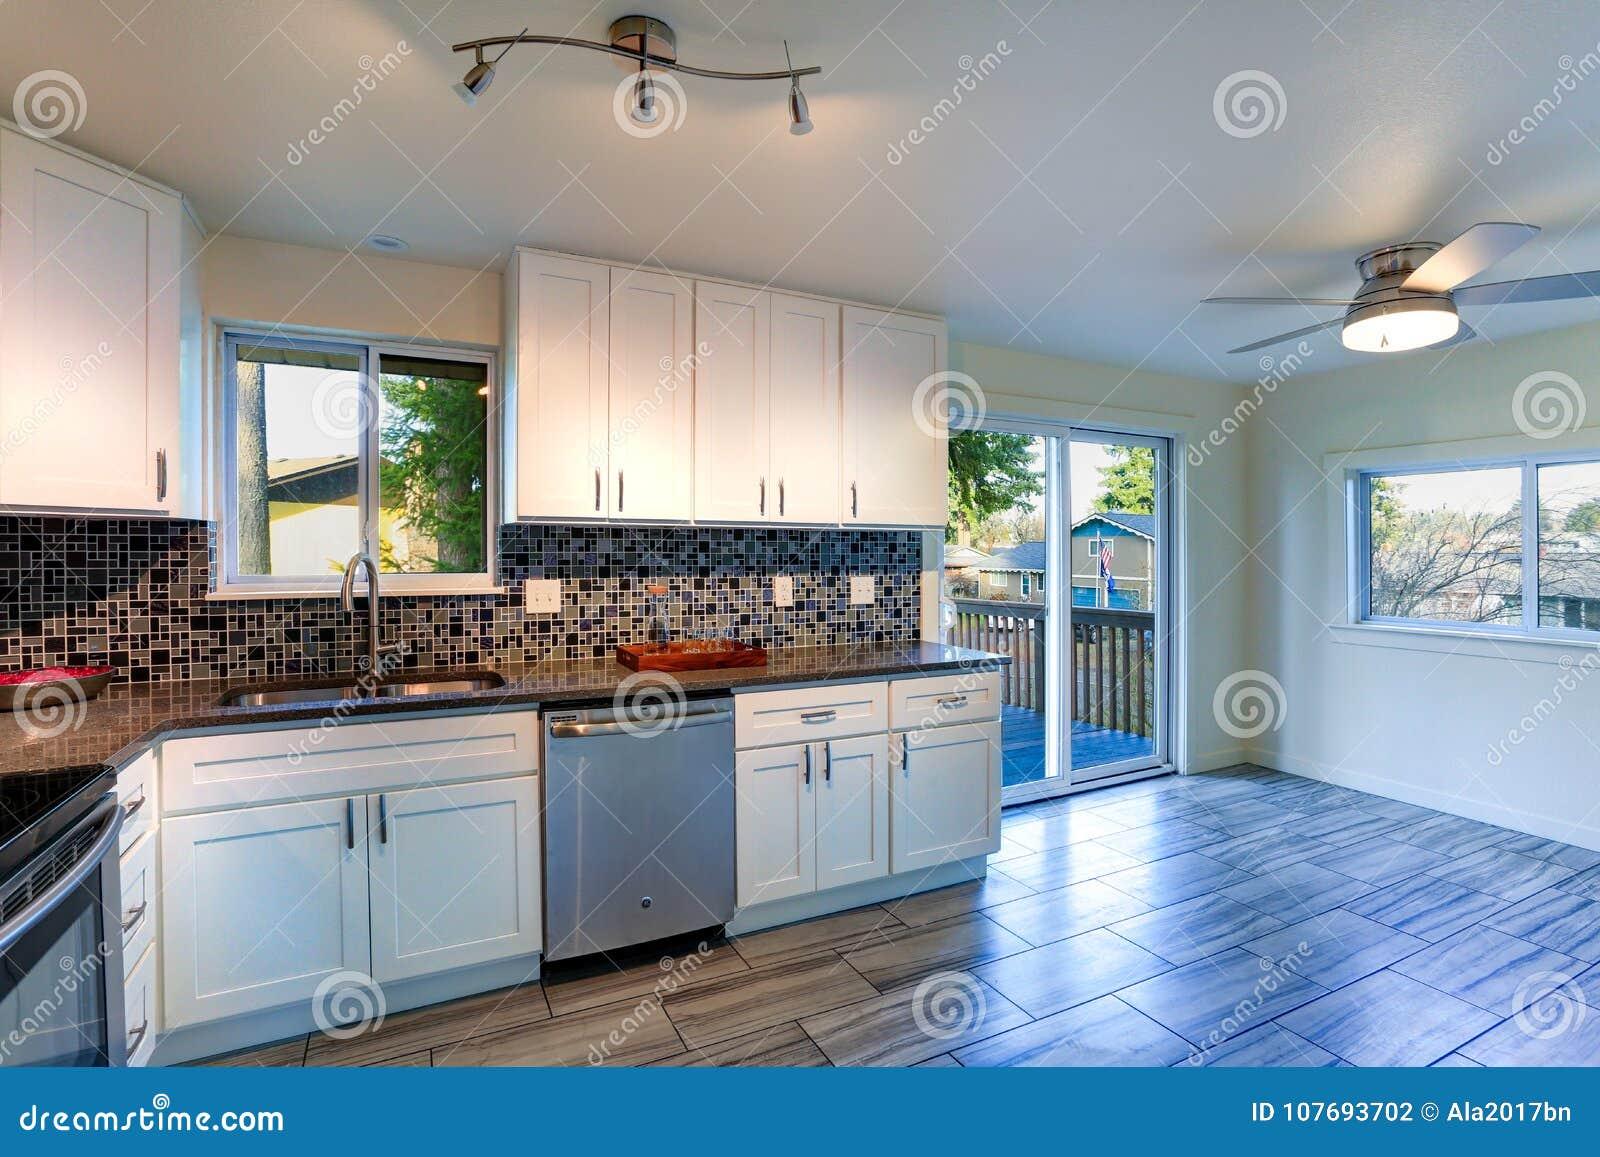 L Shape Kitchen Room Design Stock Photo Image Of Bright Architecture 107693702